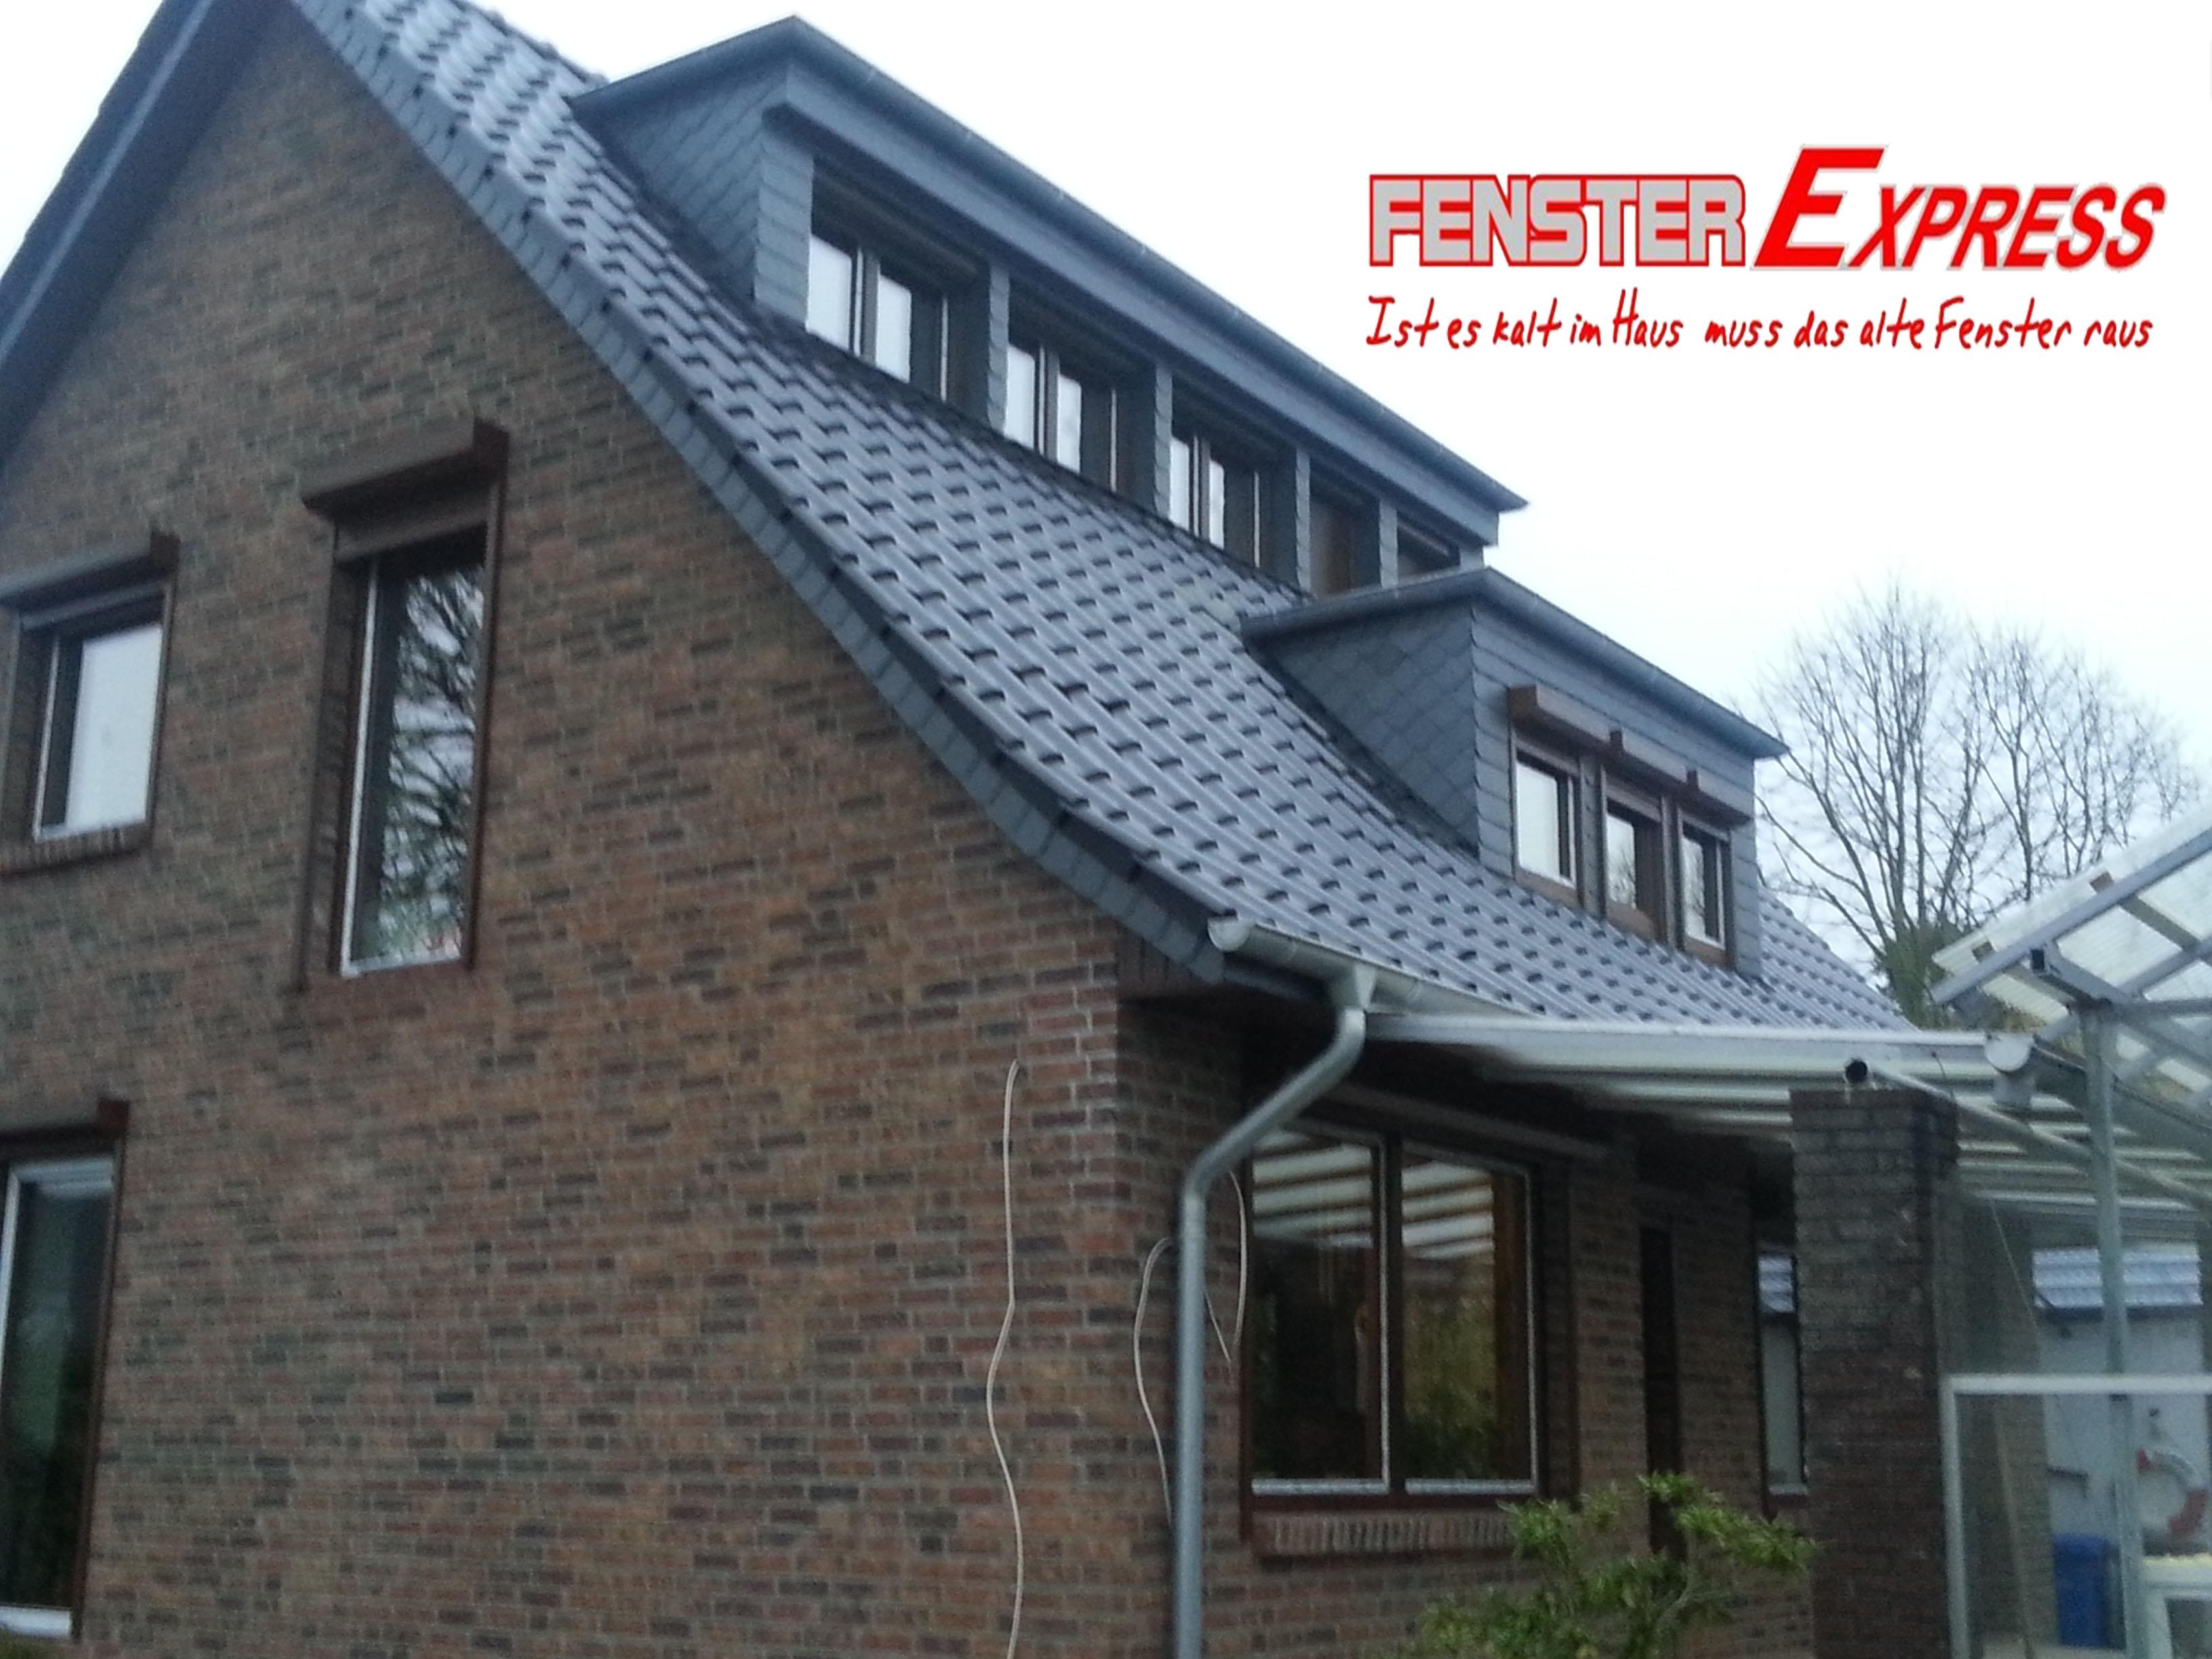 Fenster Express GmbH